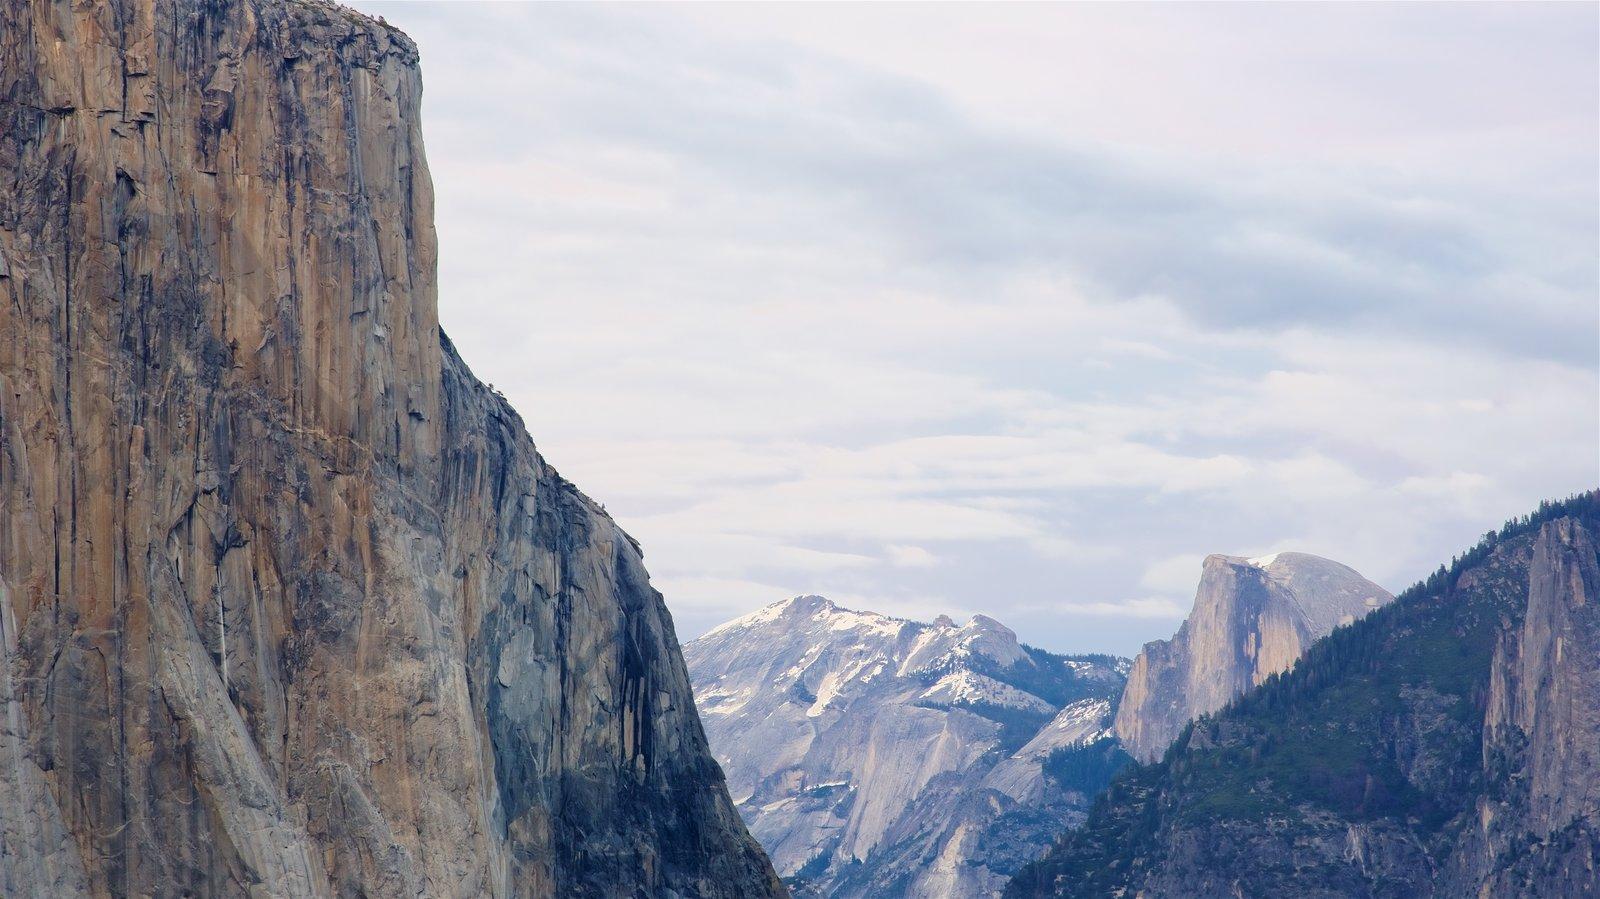 Tunnel View caracterizando montanhas